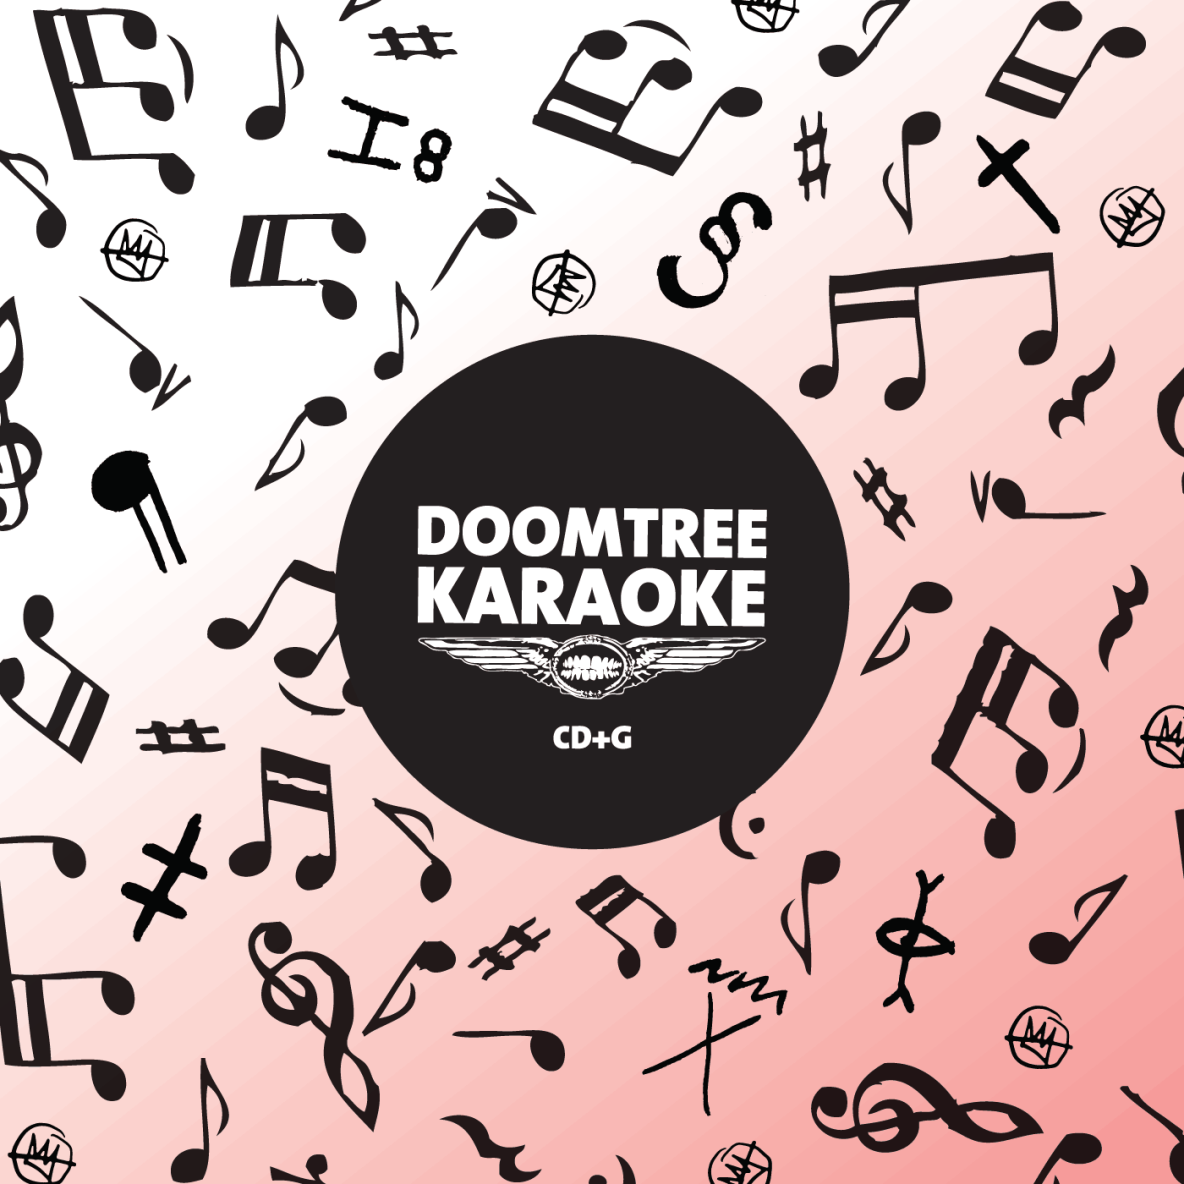 Doomtree-Karaoke